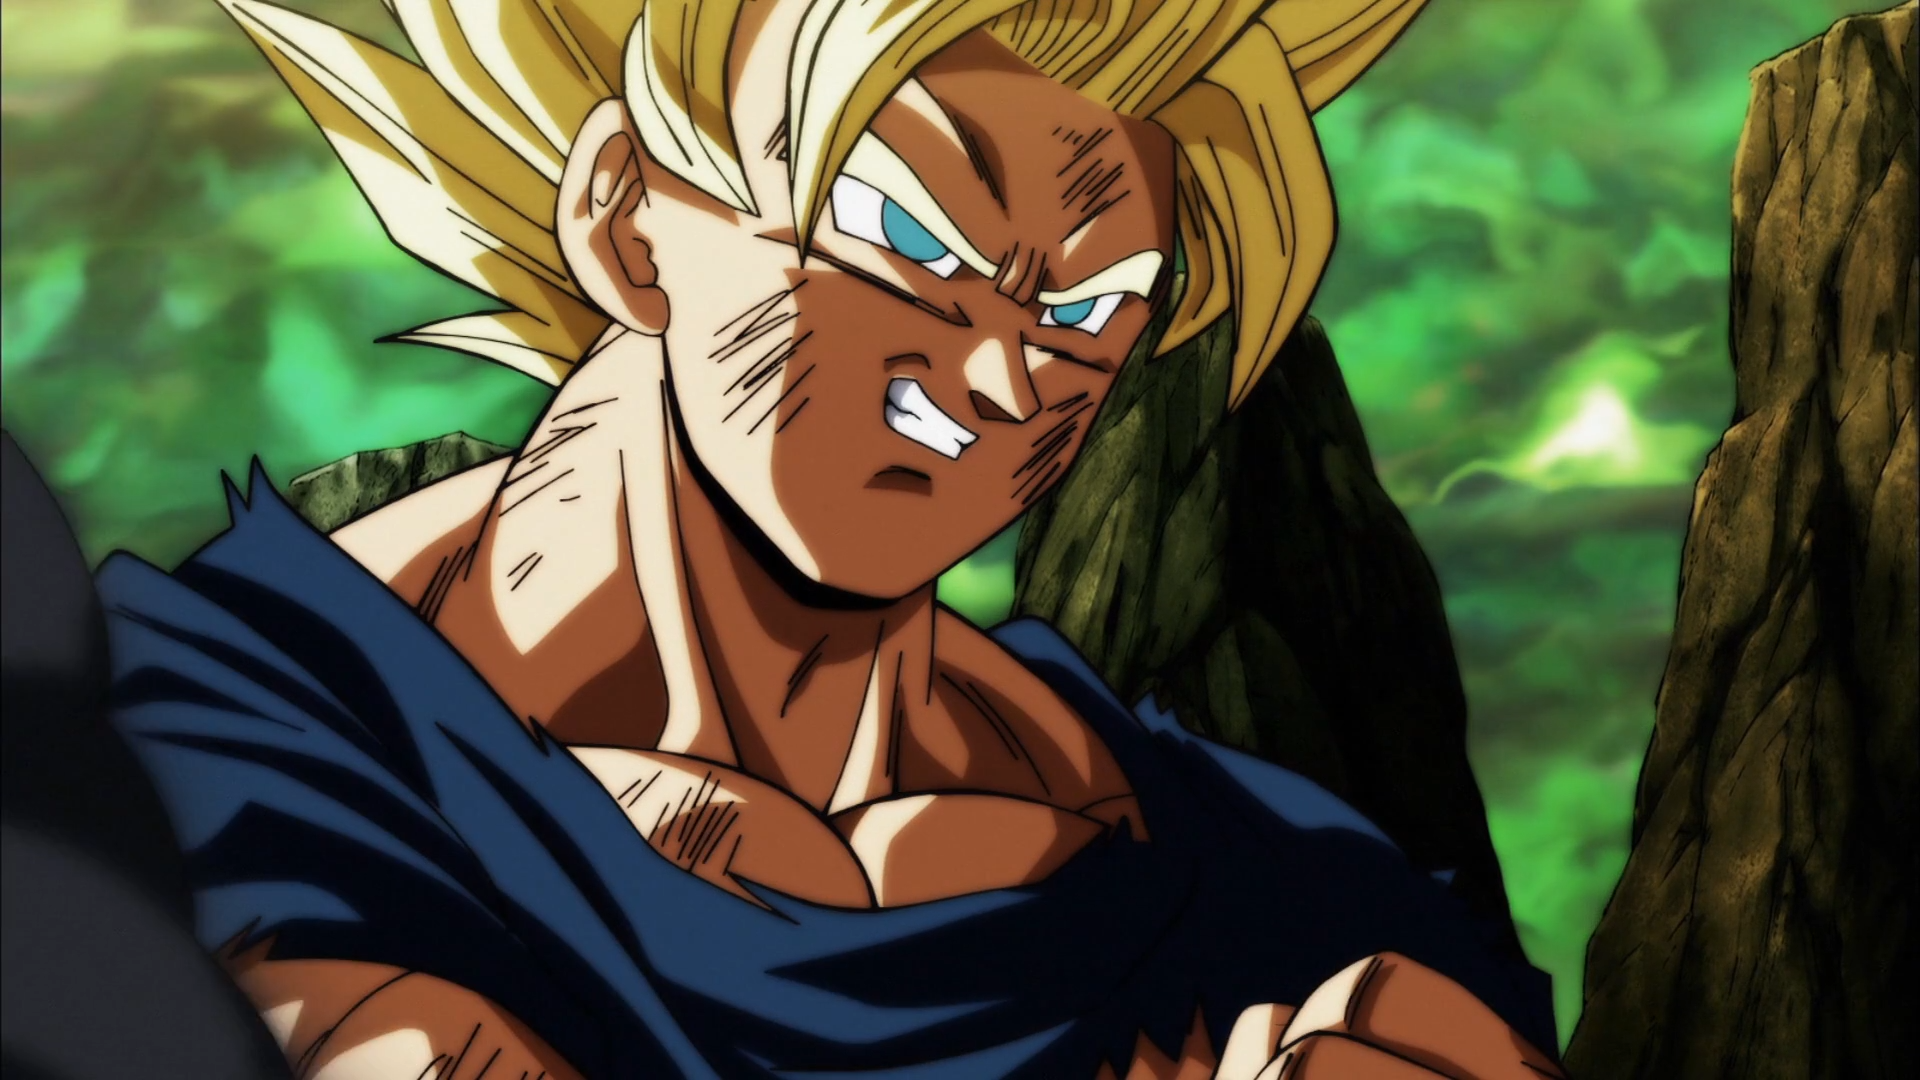 Dragon Ball Super Goku Saiyan HD Wallpaper